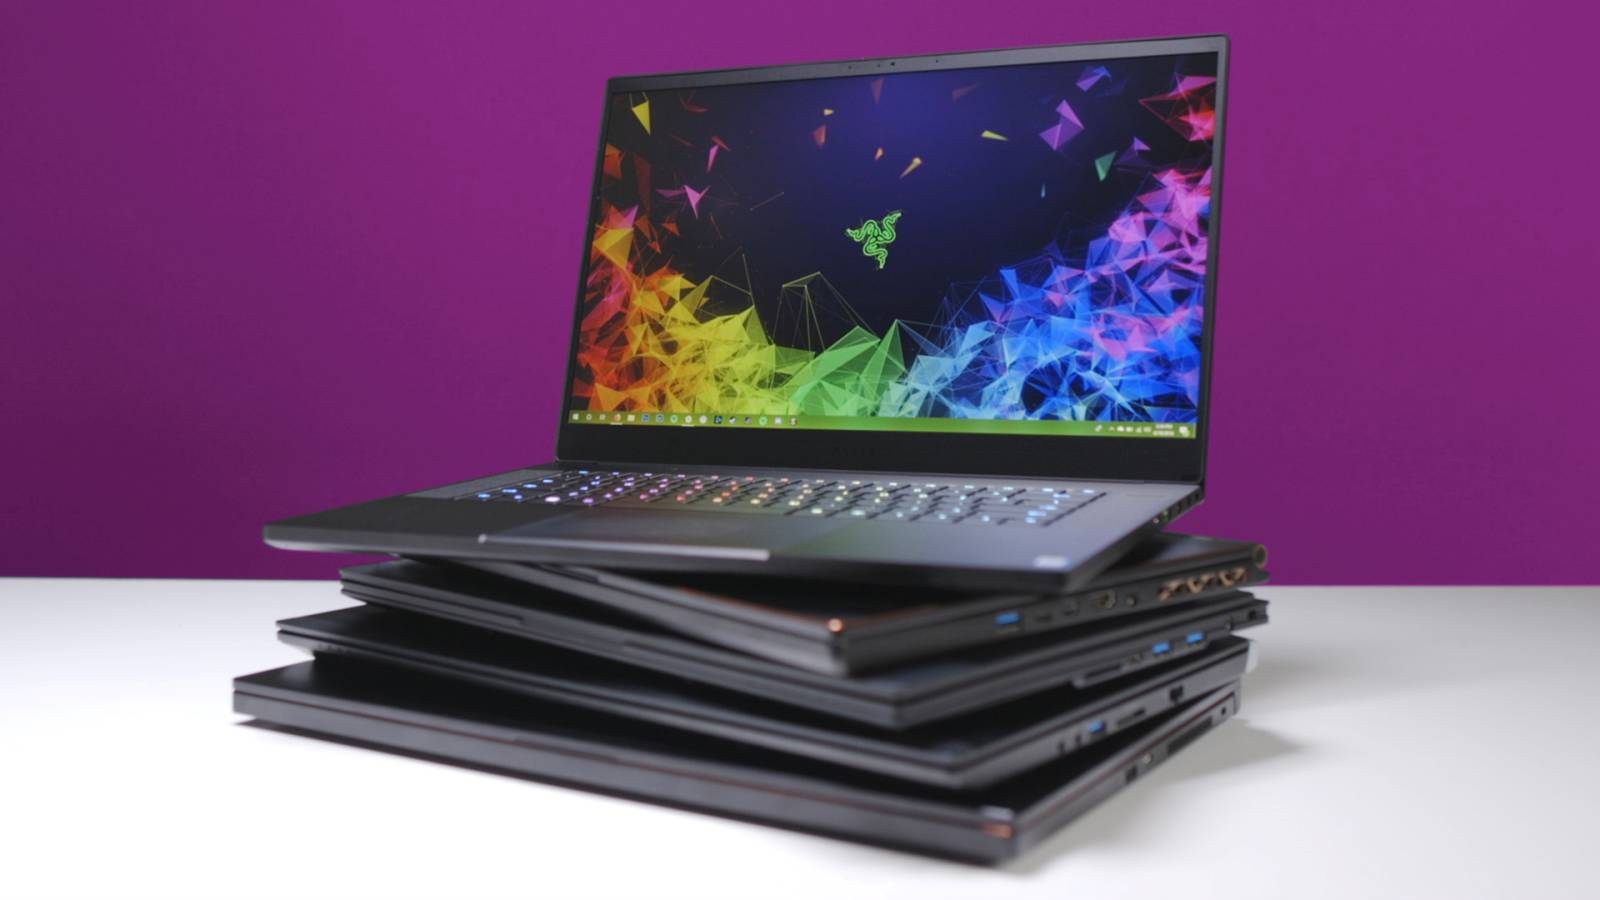 eMAG. 8000 de LEI Pret REDUS pentru Laptop-uri in Revolutia Preturilor